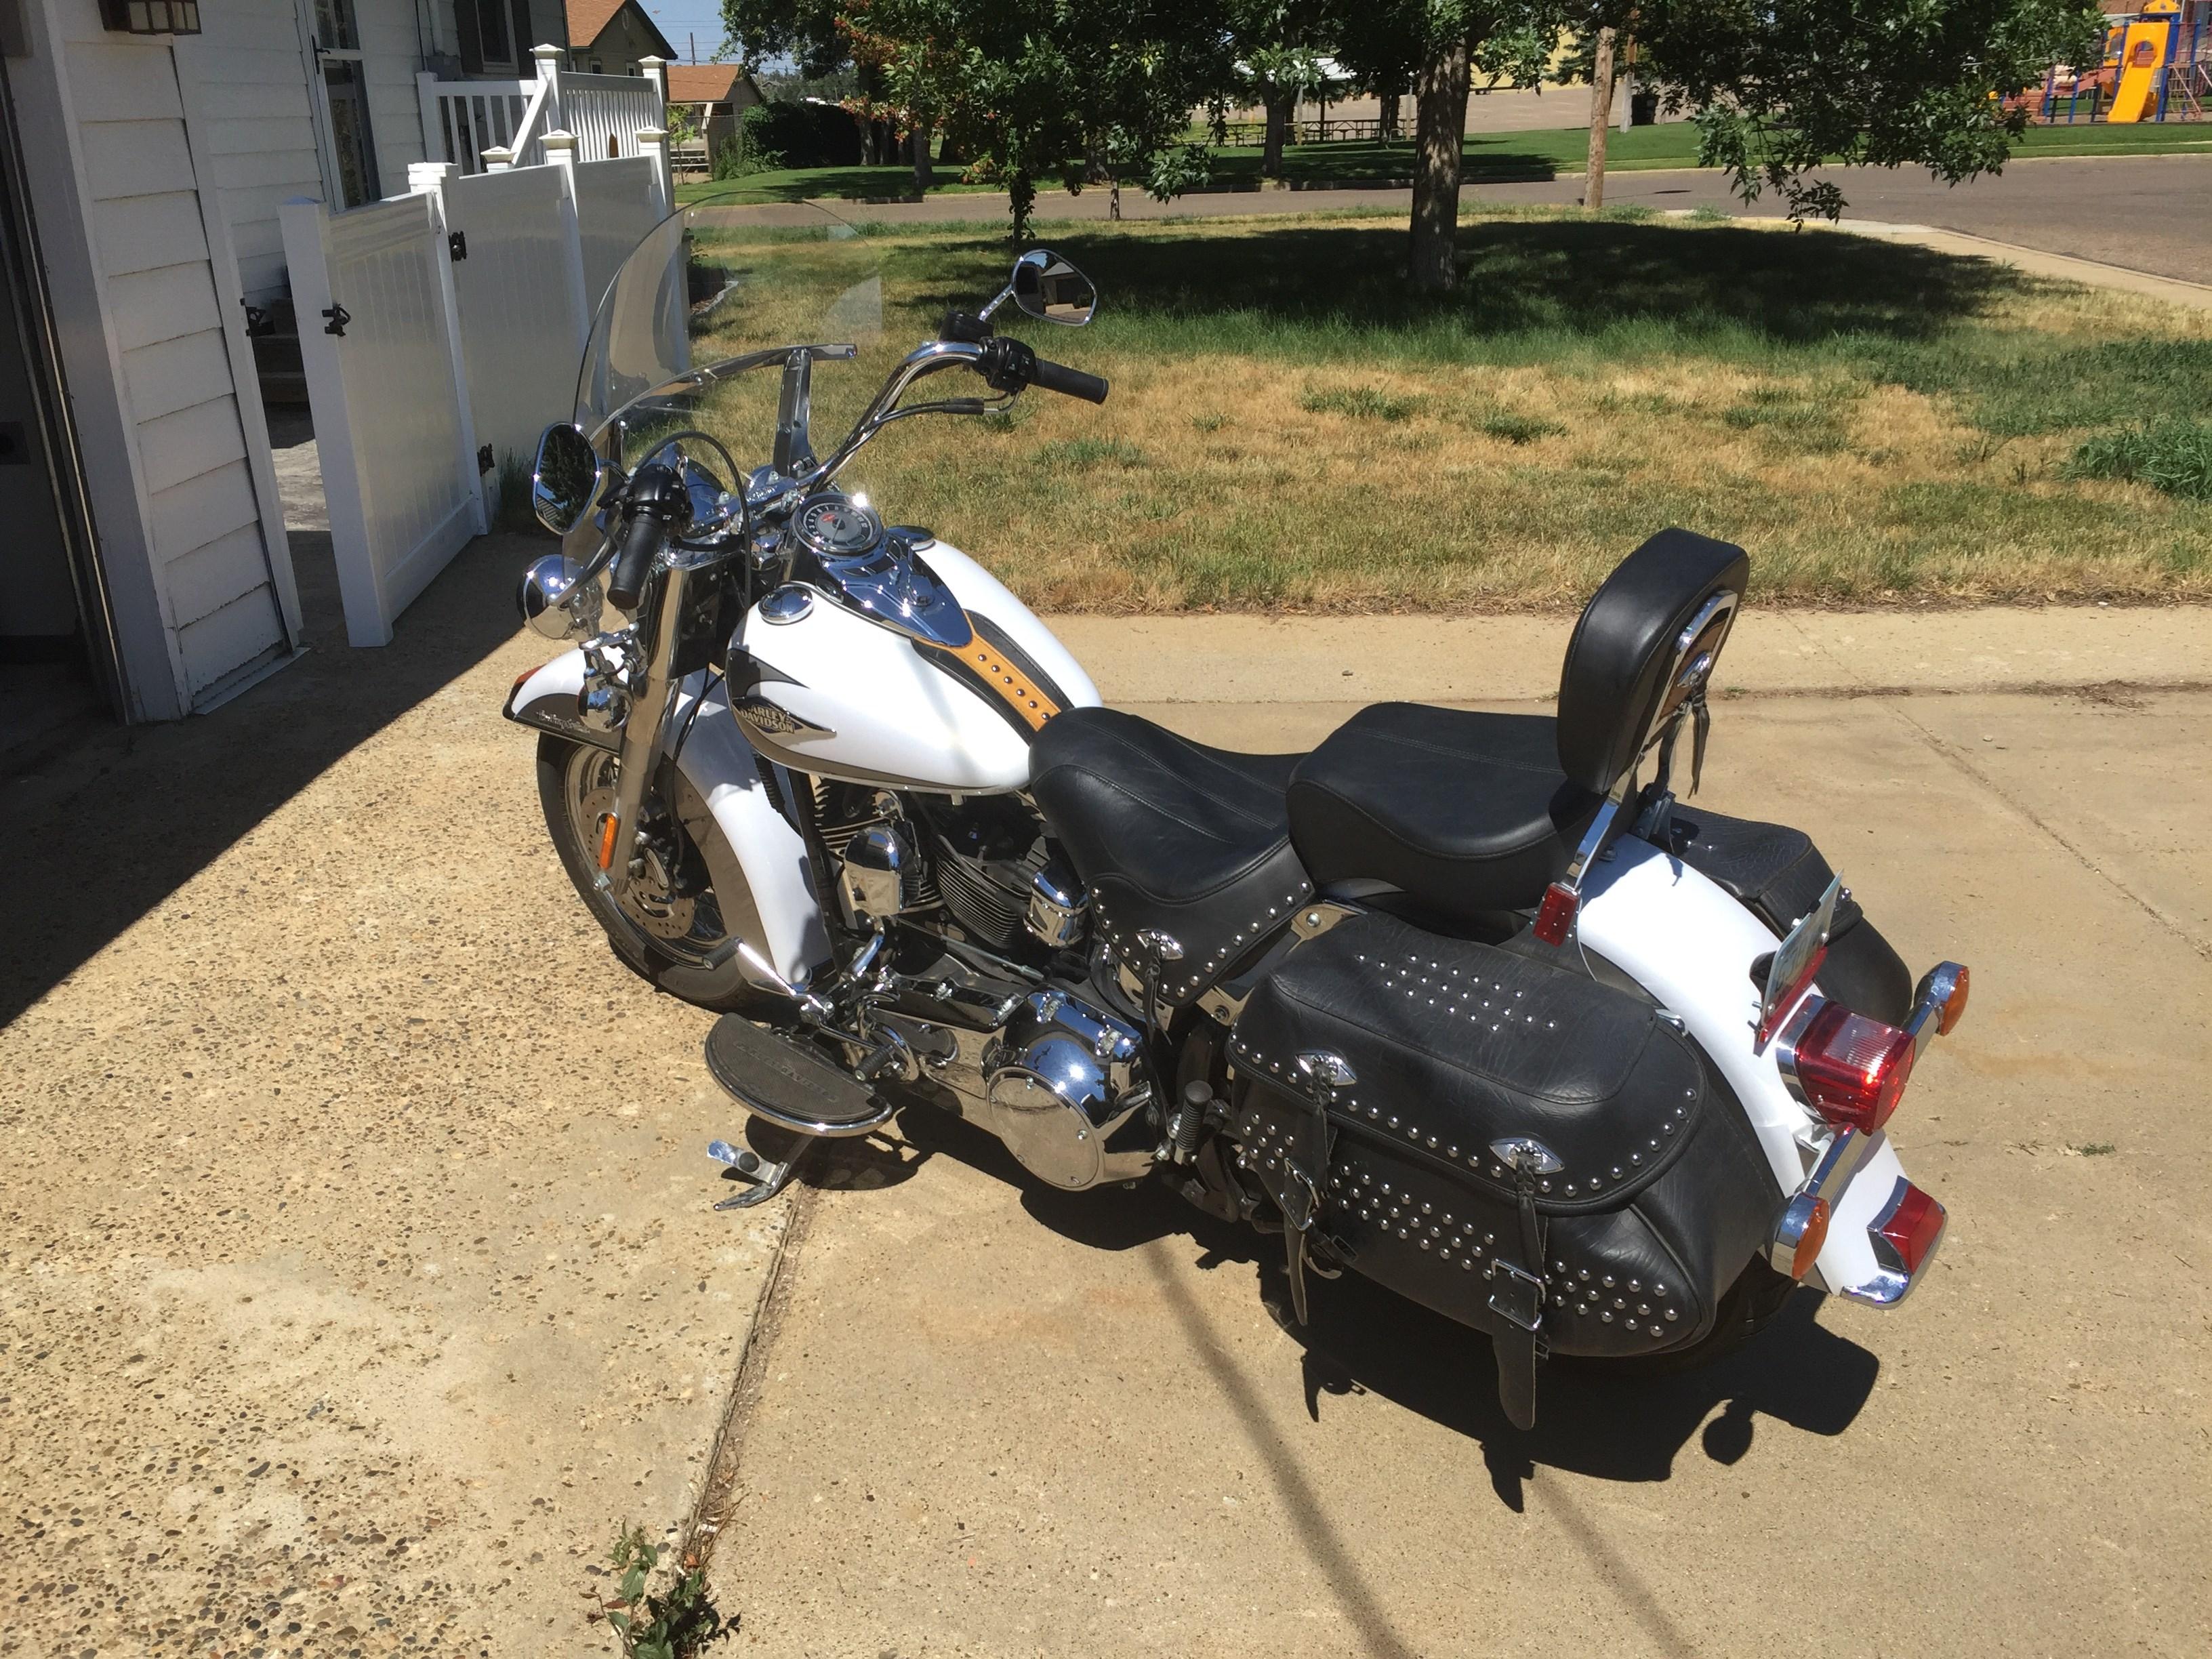 Used Harley Davidson Motorcycles For Sale San Marcos Tx >> 2009 Harley-Davidson® FLSTC Heritage Softail® Classic (White w/gray), Dickinson, North Dakota ...